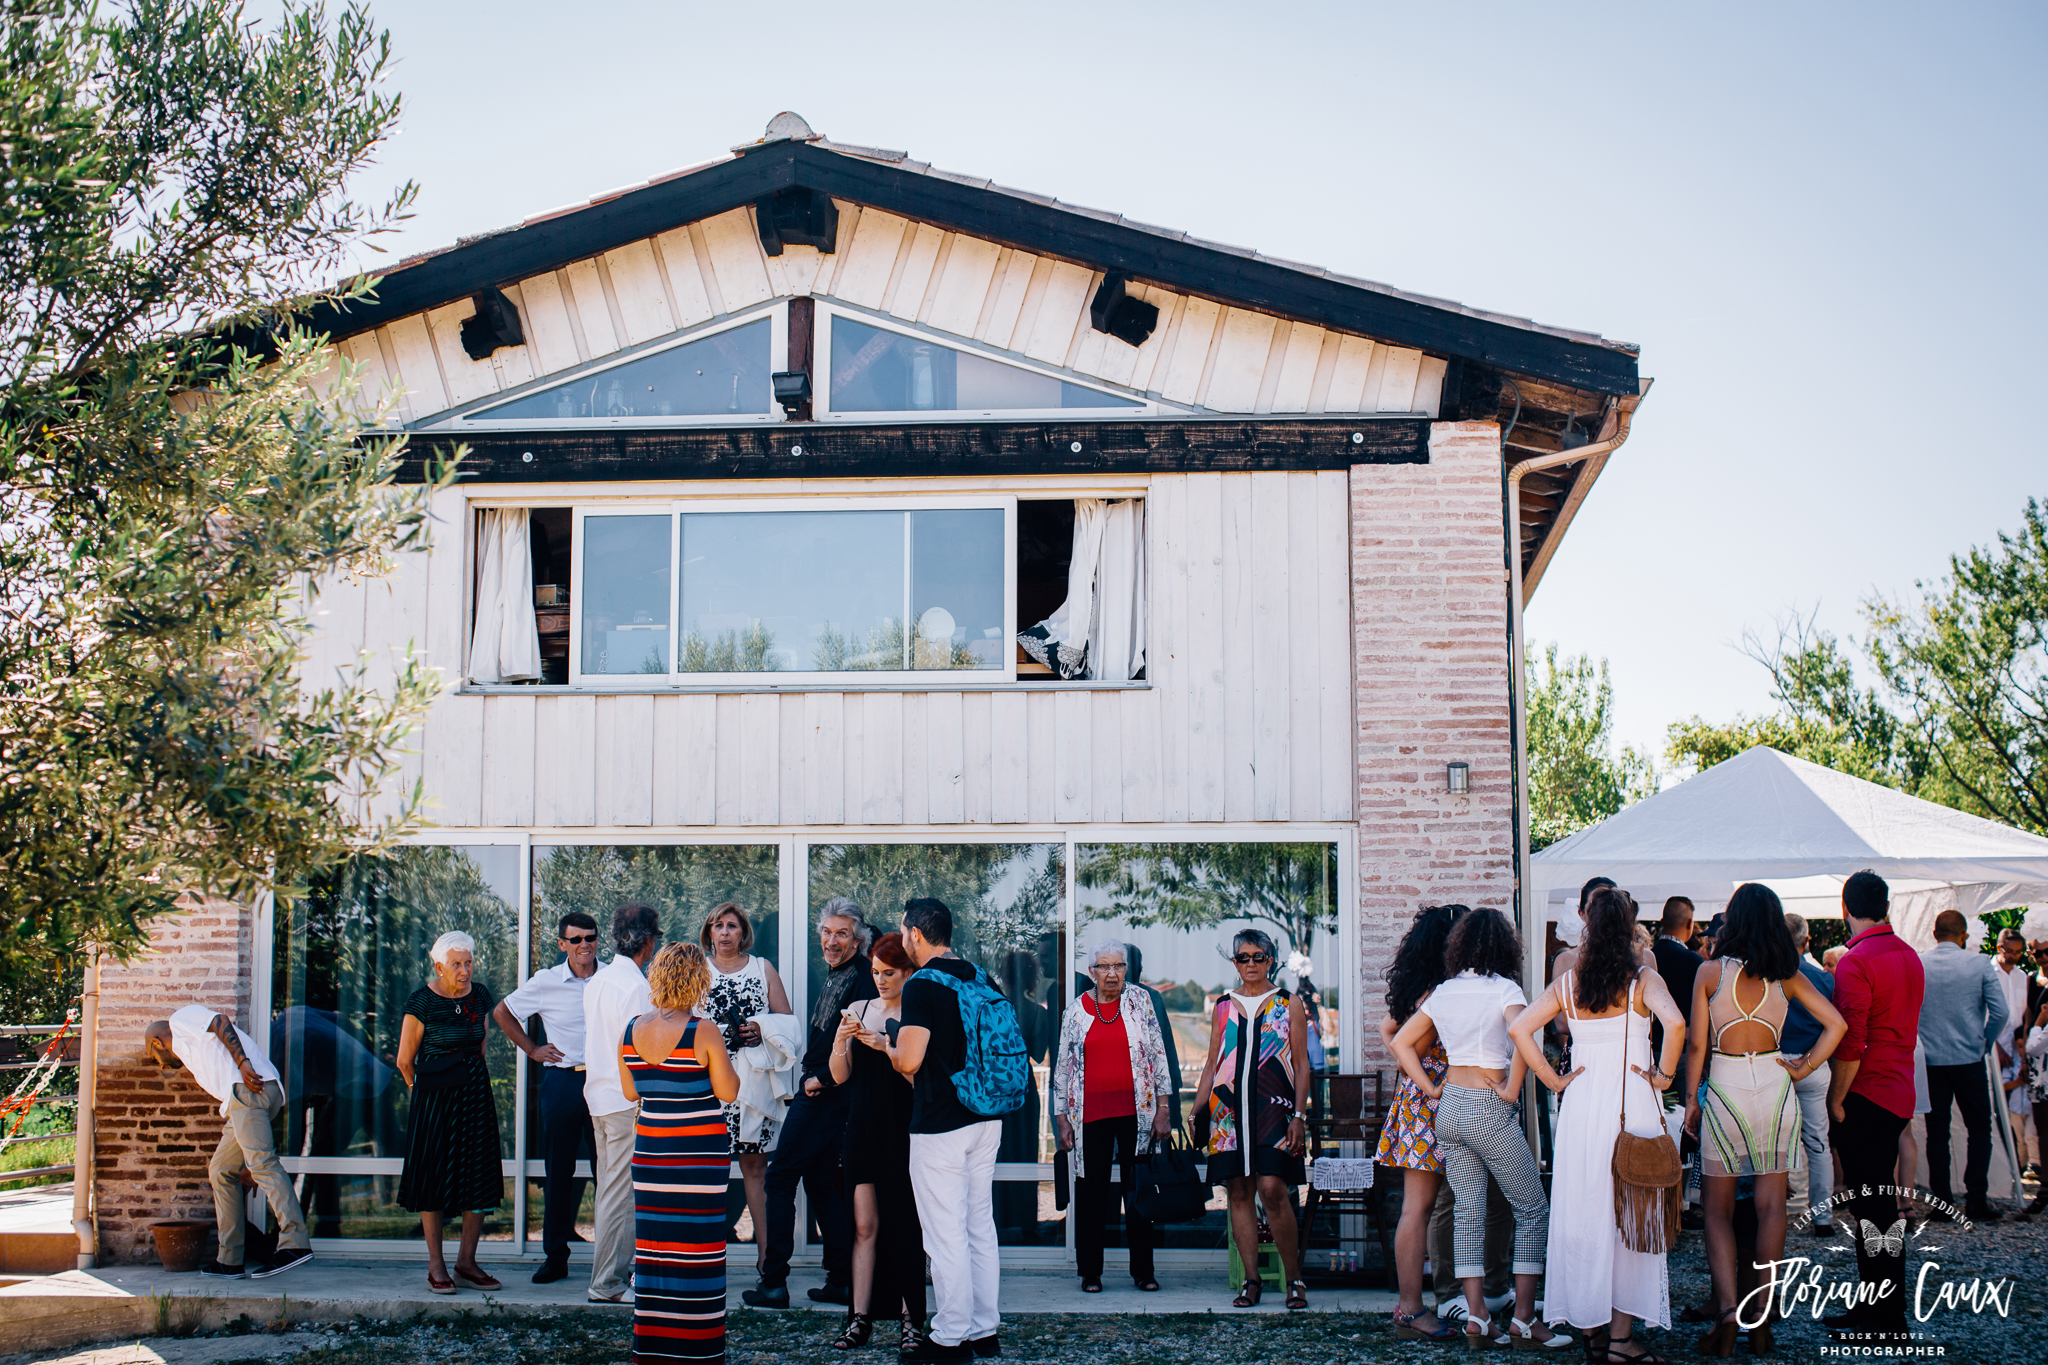 photographe-mariage-toulouse-rocknroll-maries-tatoues-floriane-caux-46